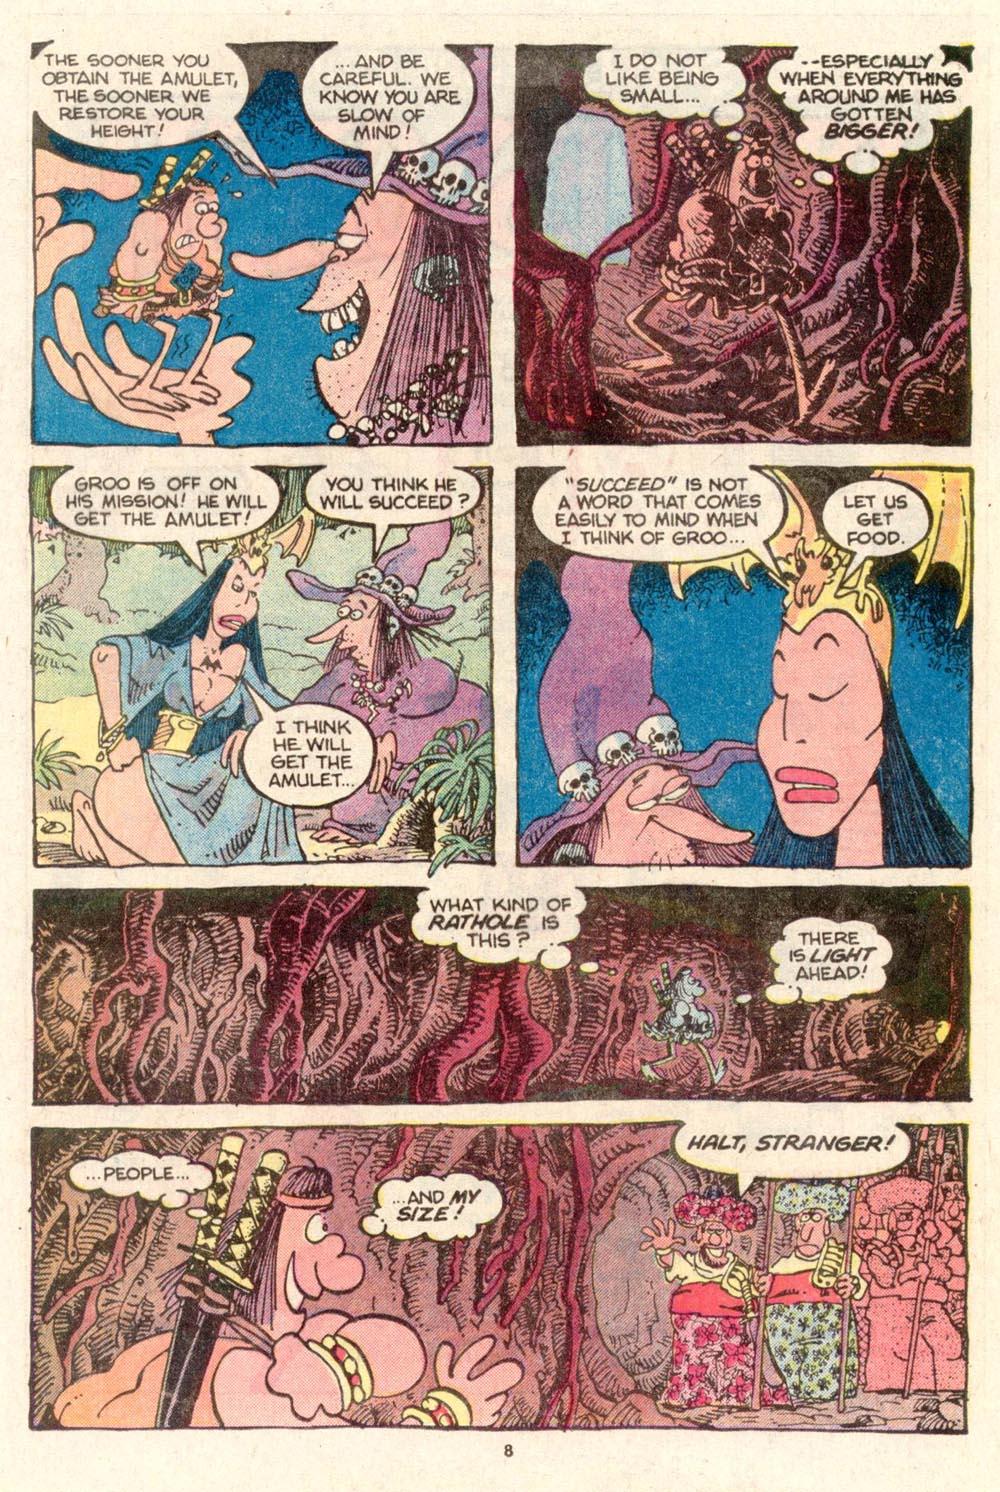 Read online Sergio Aragonés Groo the Wanderer comic -  Issue #26 - 9